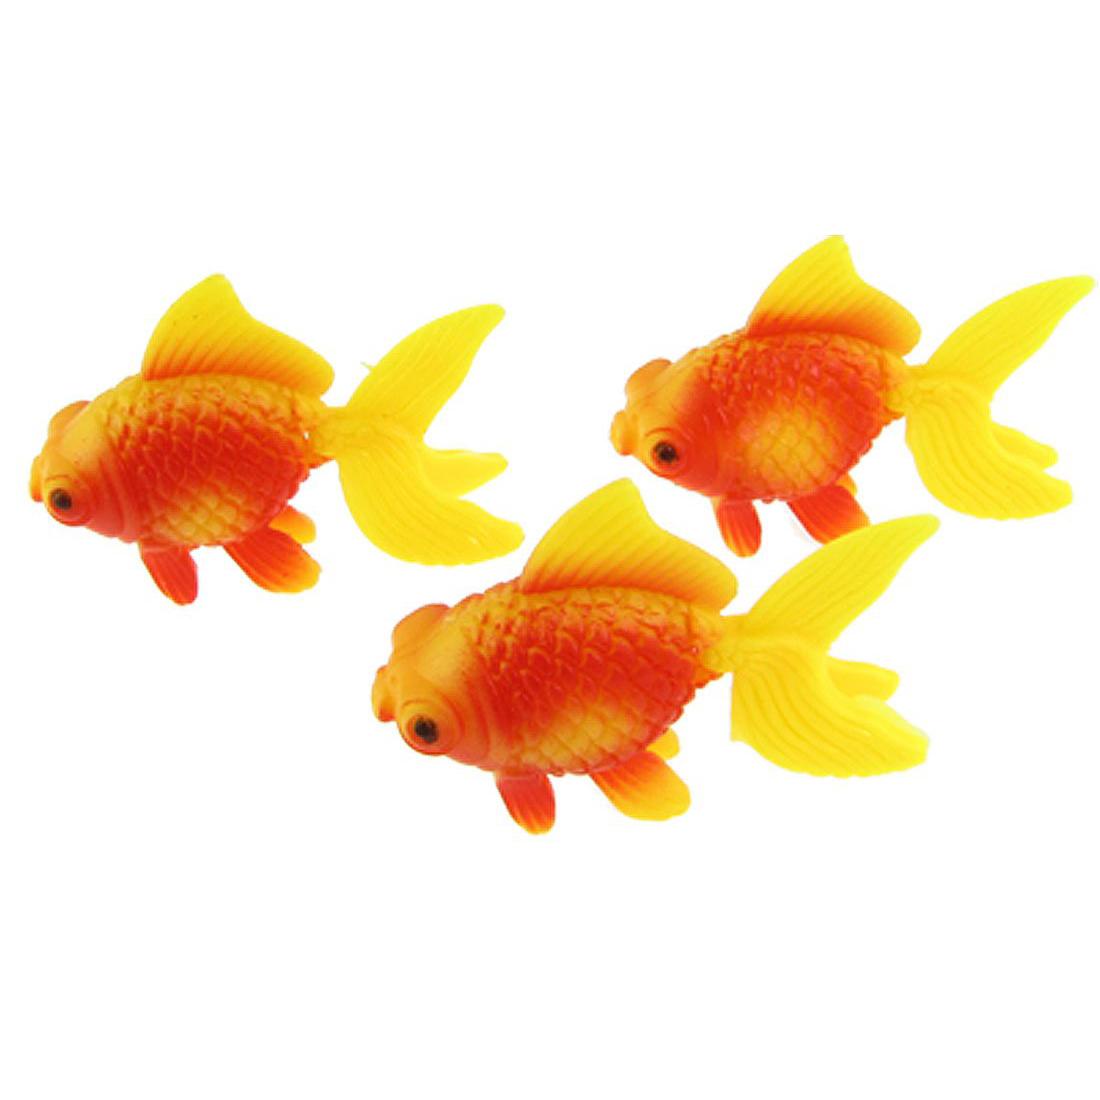 2x aquarium reservoir de poissons plastique poisson rouge for Poisson rouge aquarium 10l